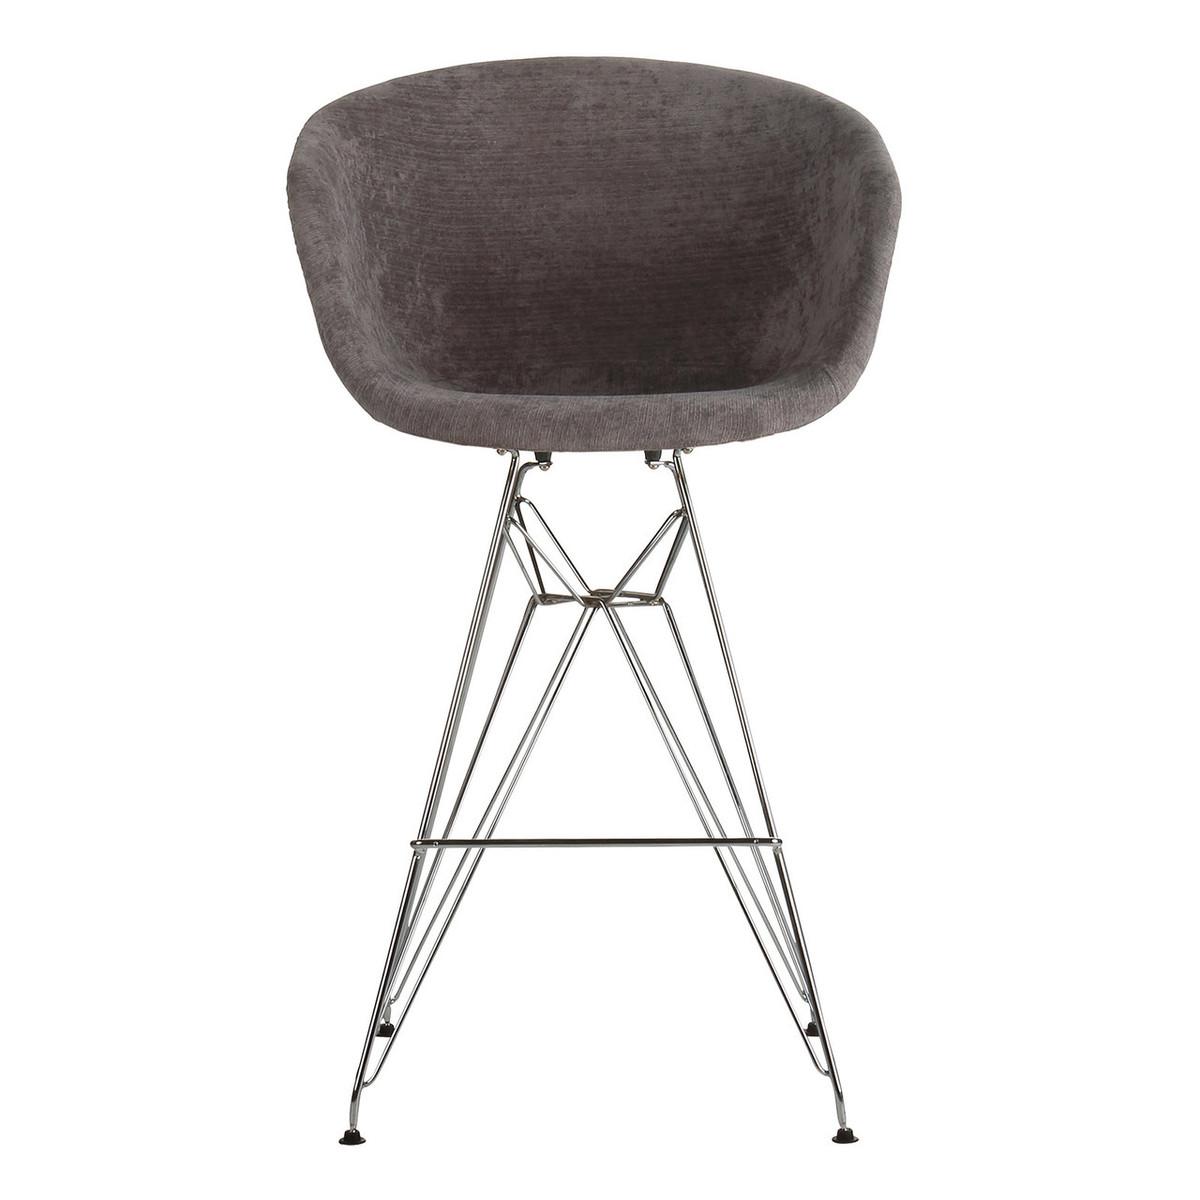 Amazing Danish Modern Dark Grey Counter Stool With Metal Eiffel Legs Lamtechconsult Wood Chair Design Ideas Lamtechconsultcom